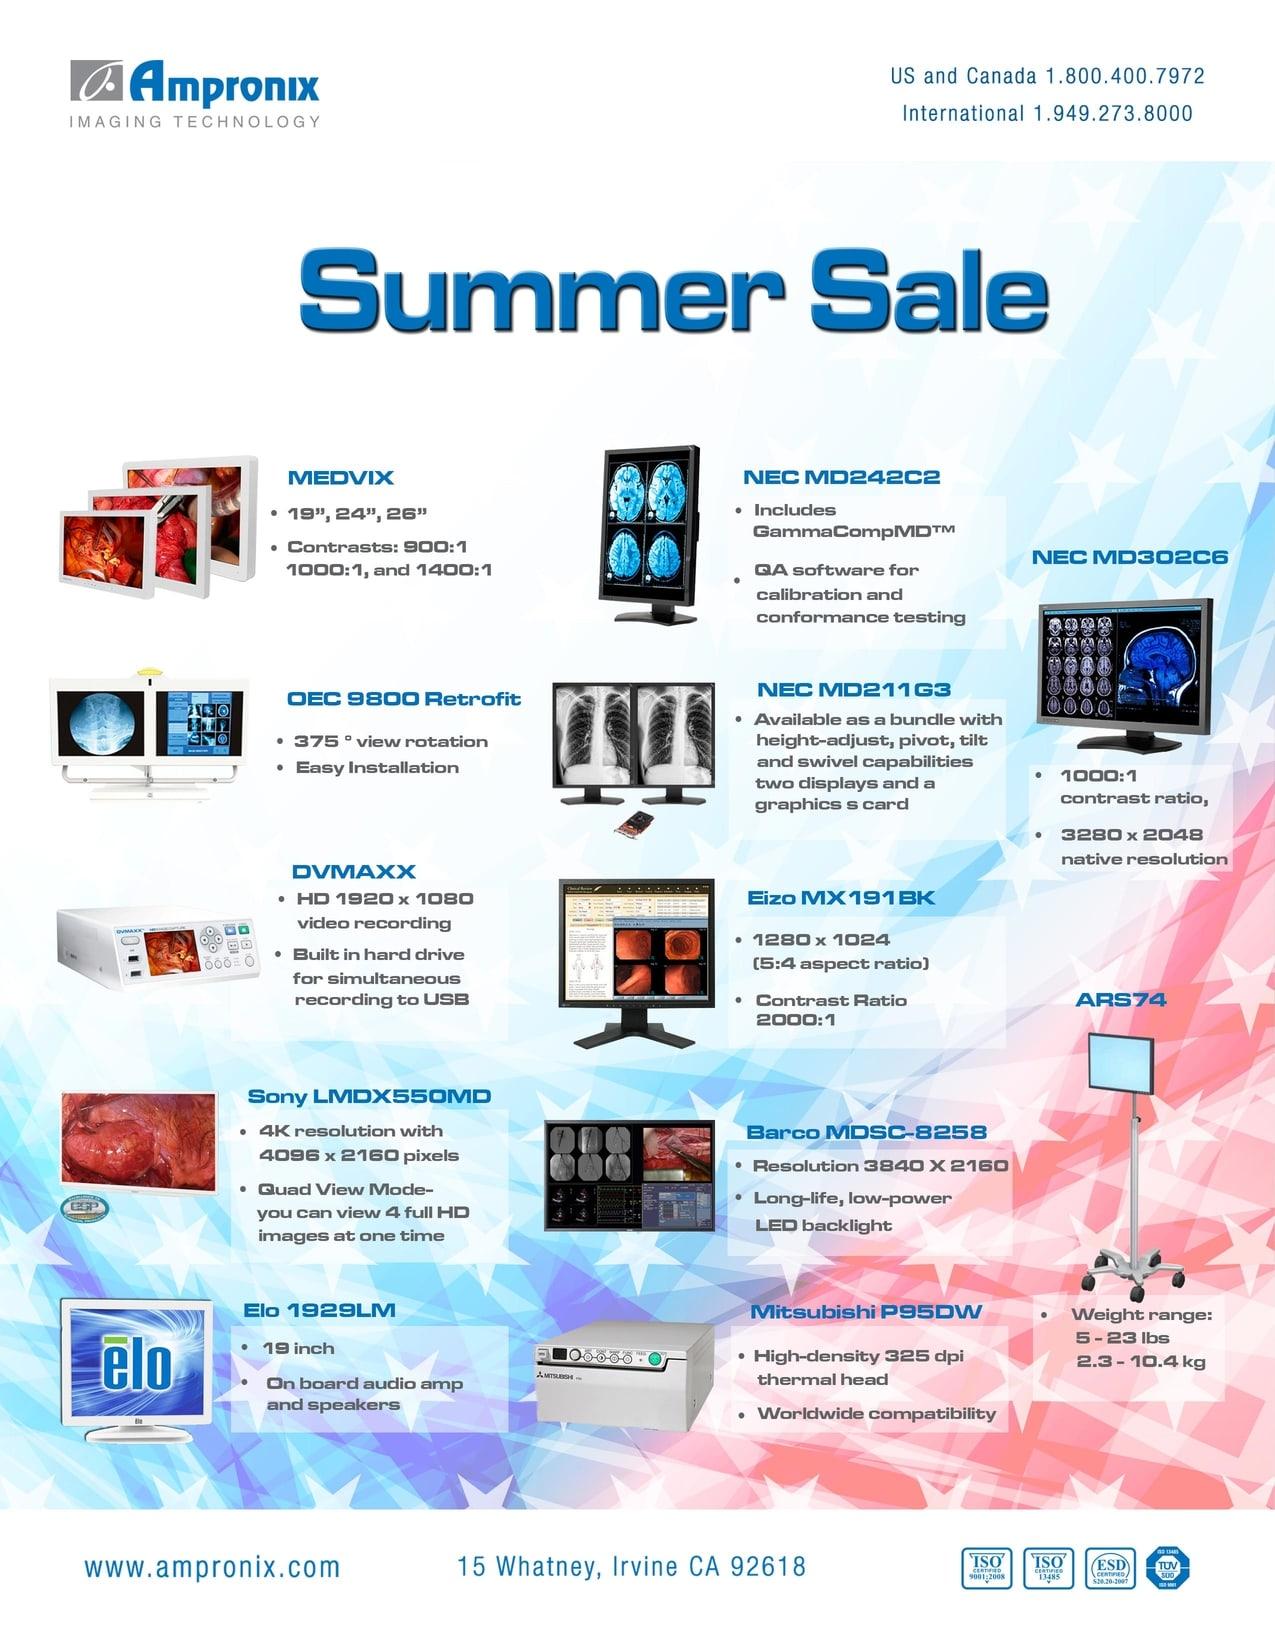 Ampronix Summer Sale